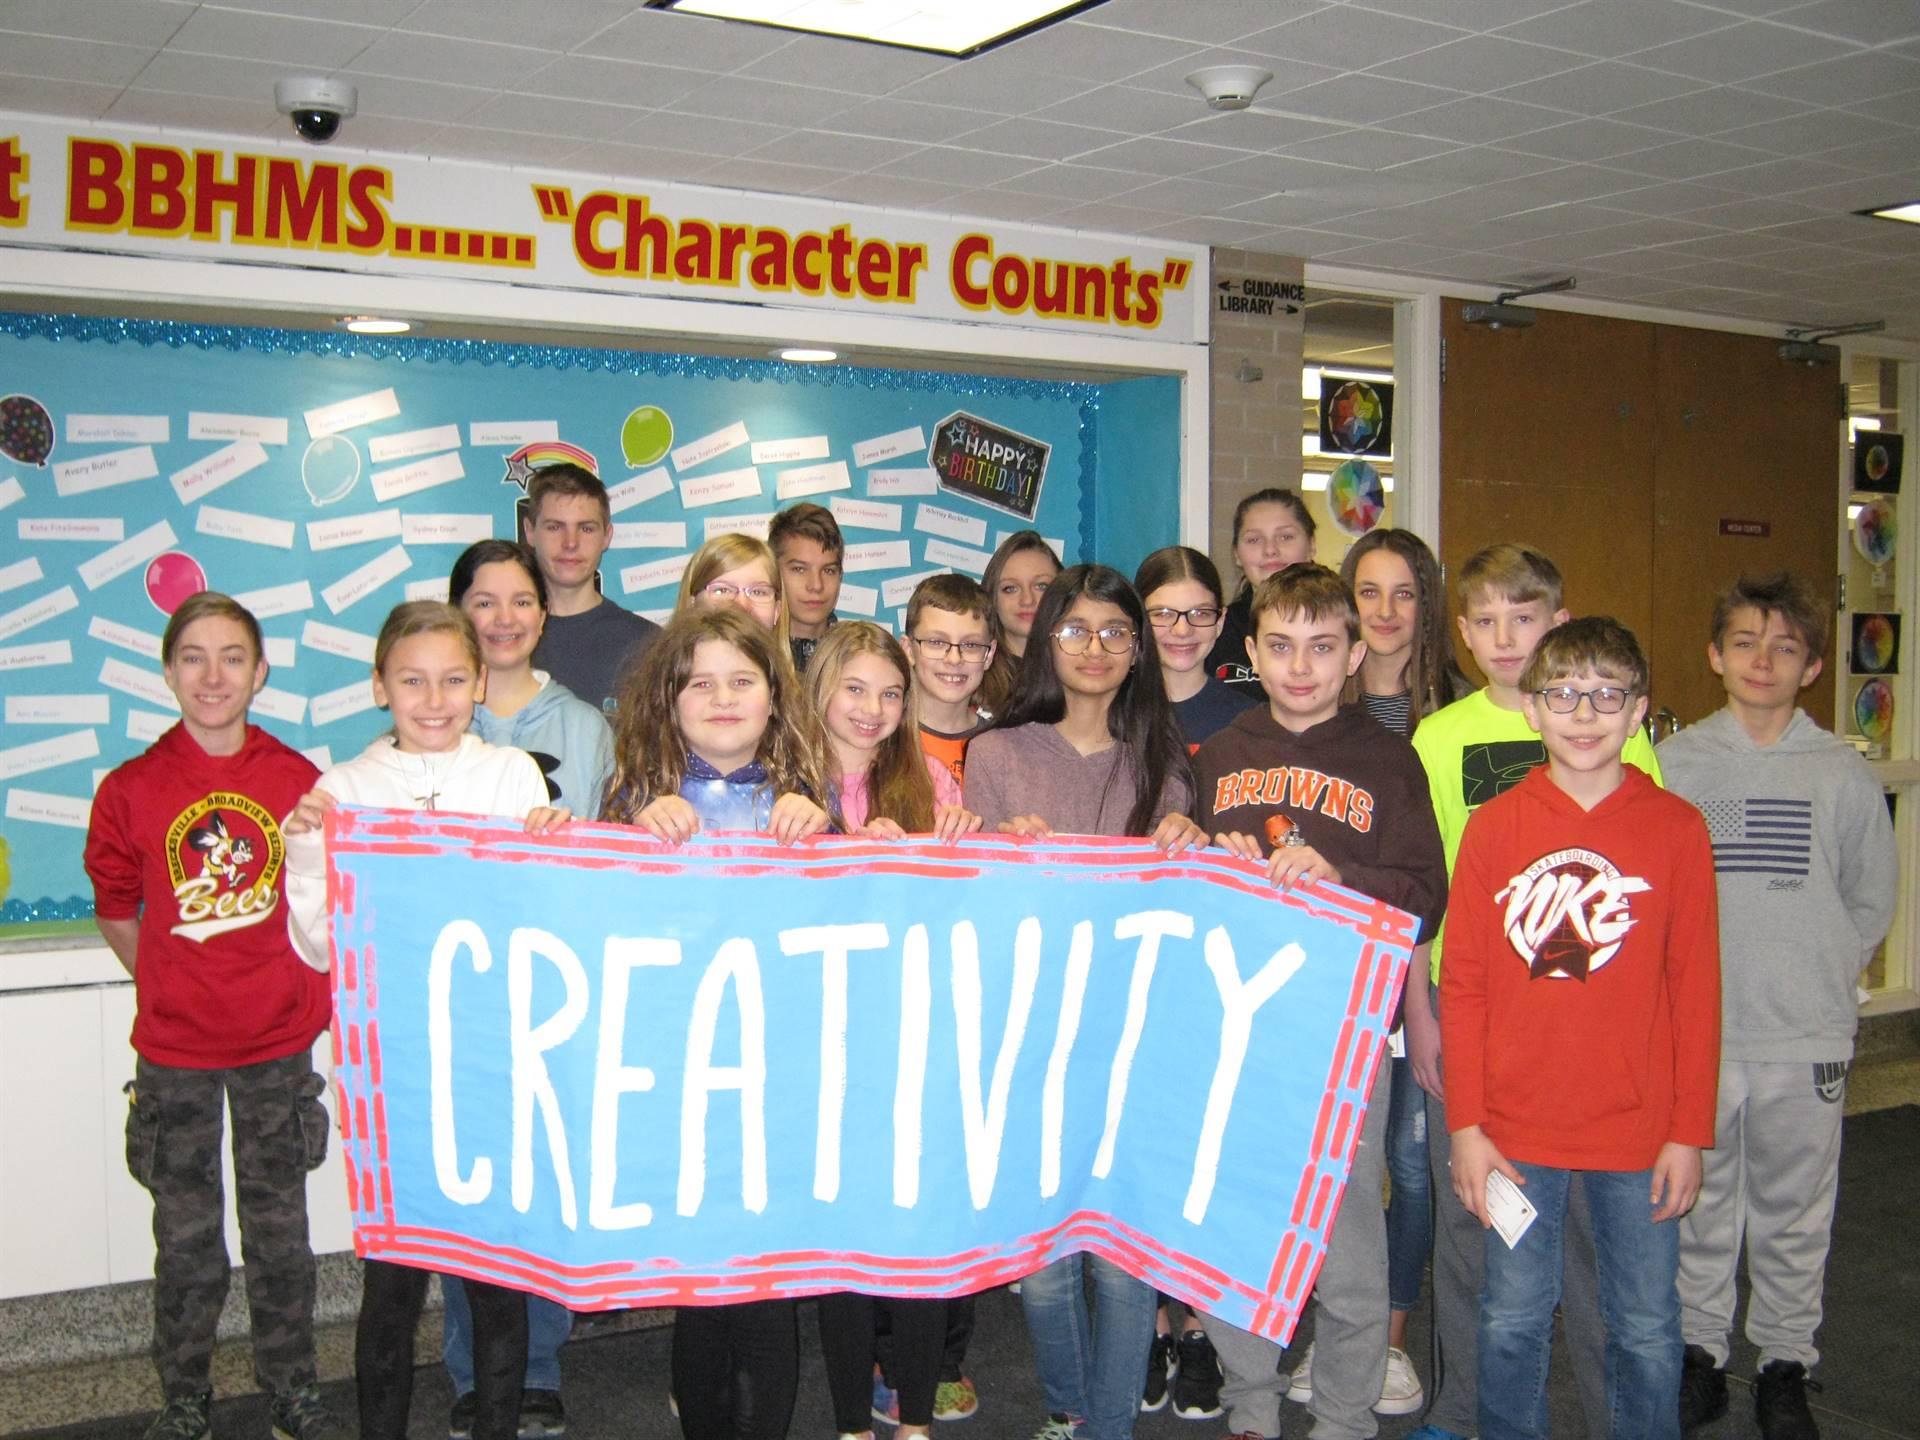 Creativity 5